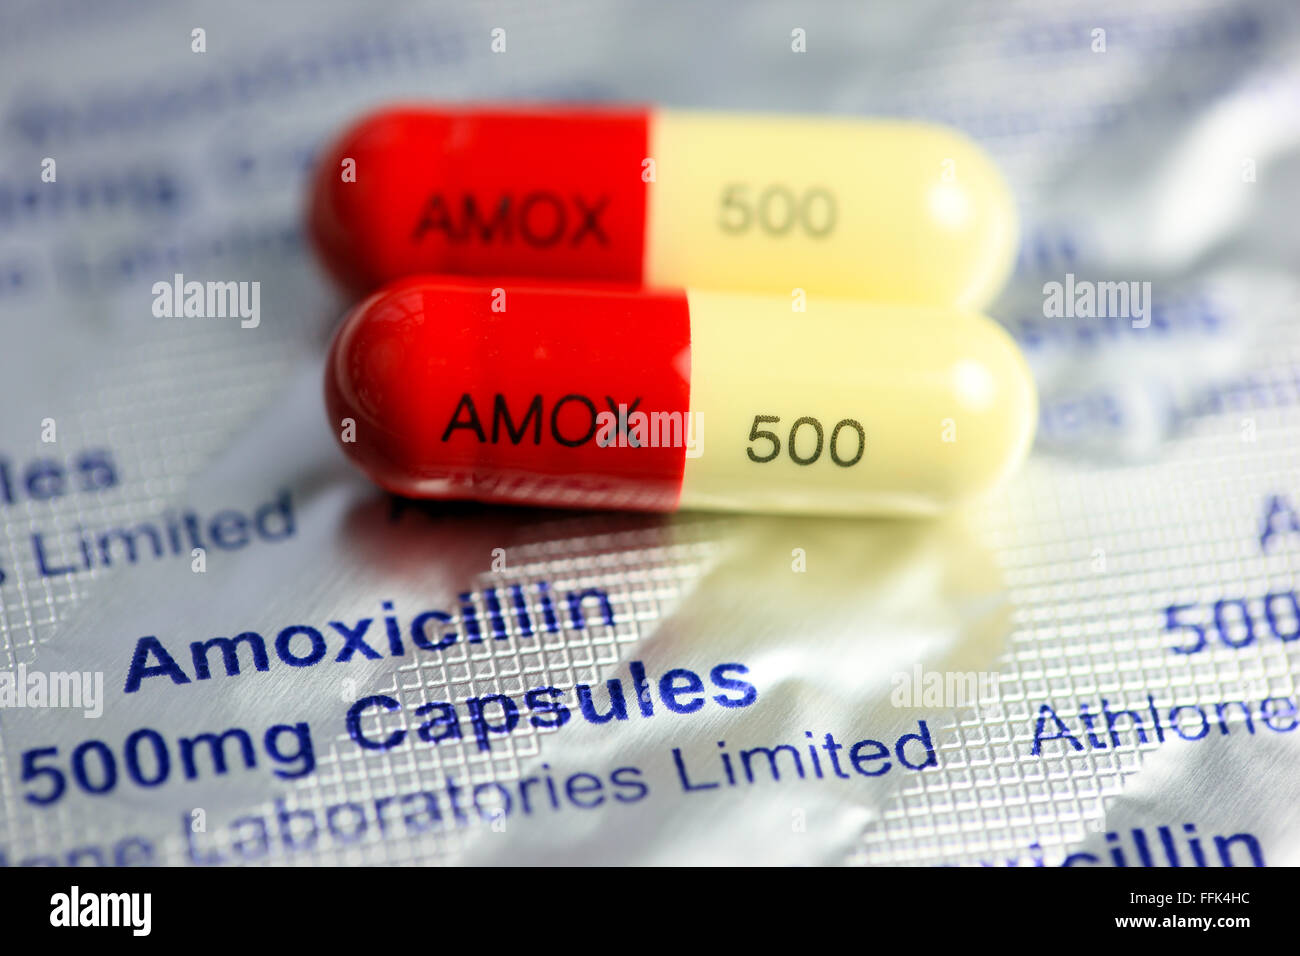 Amoxicillin capsules - Stock Image